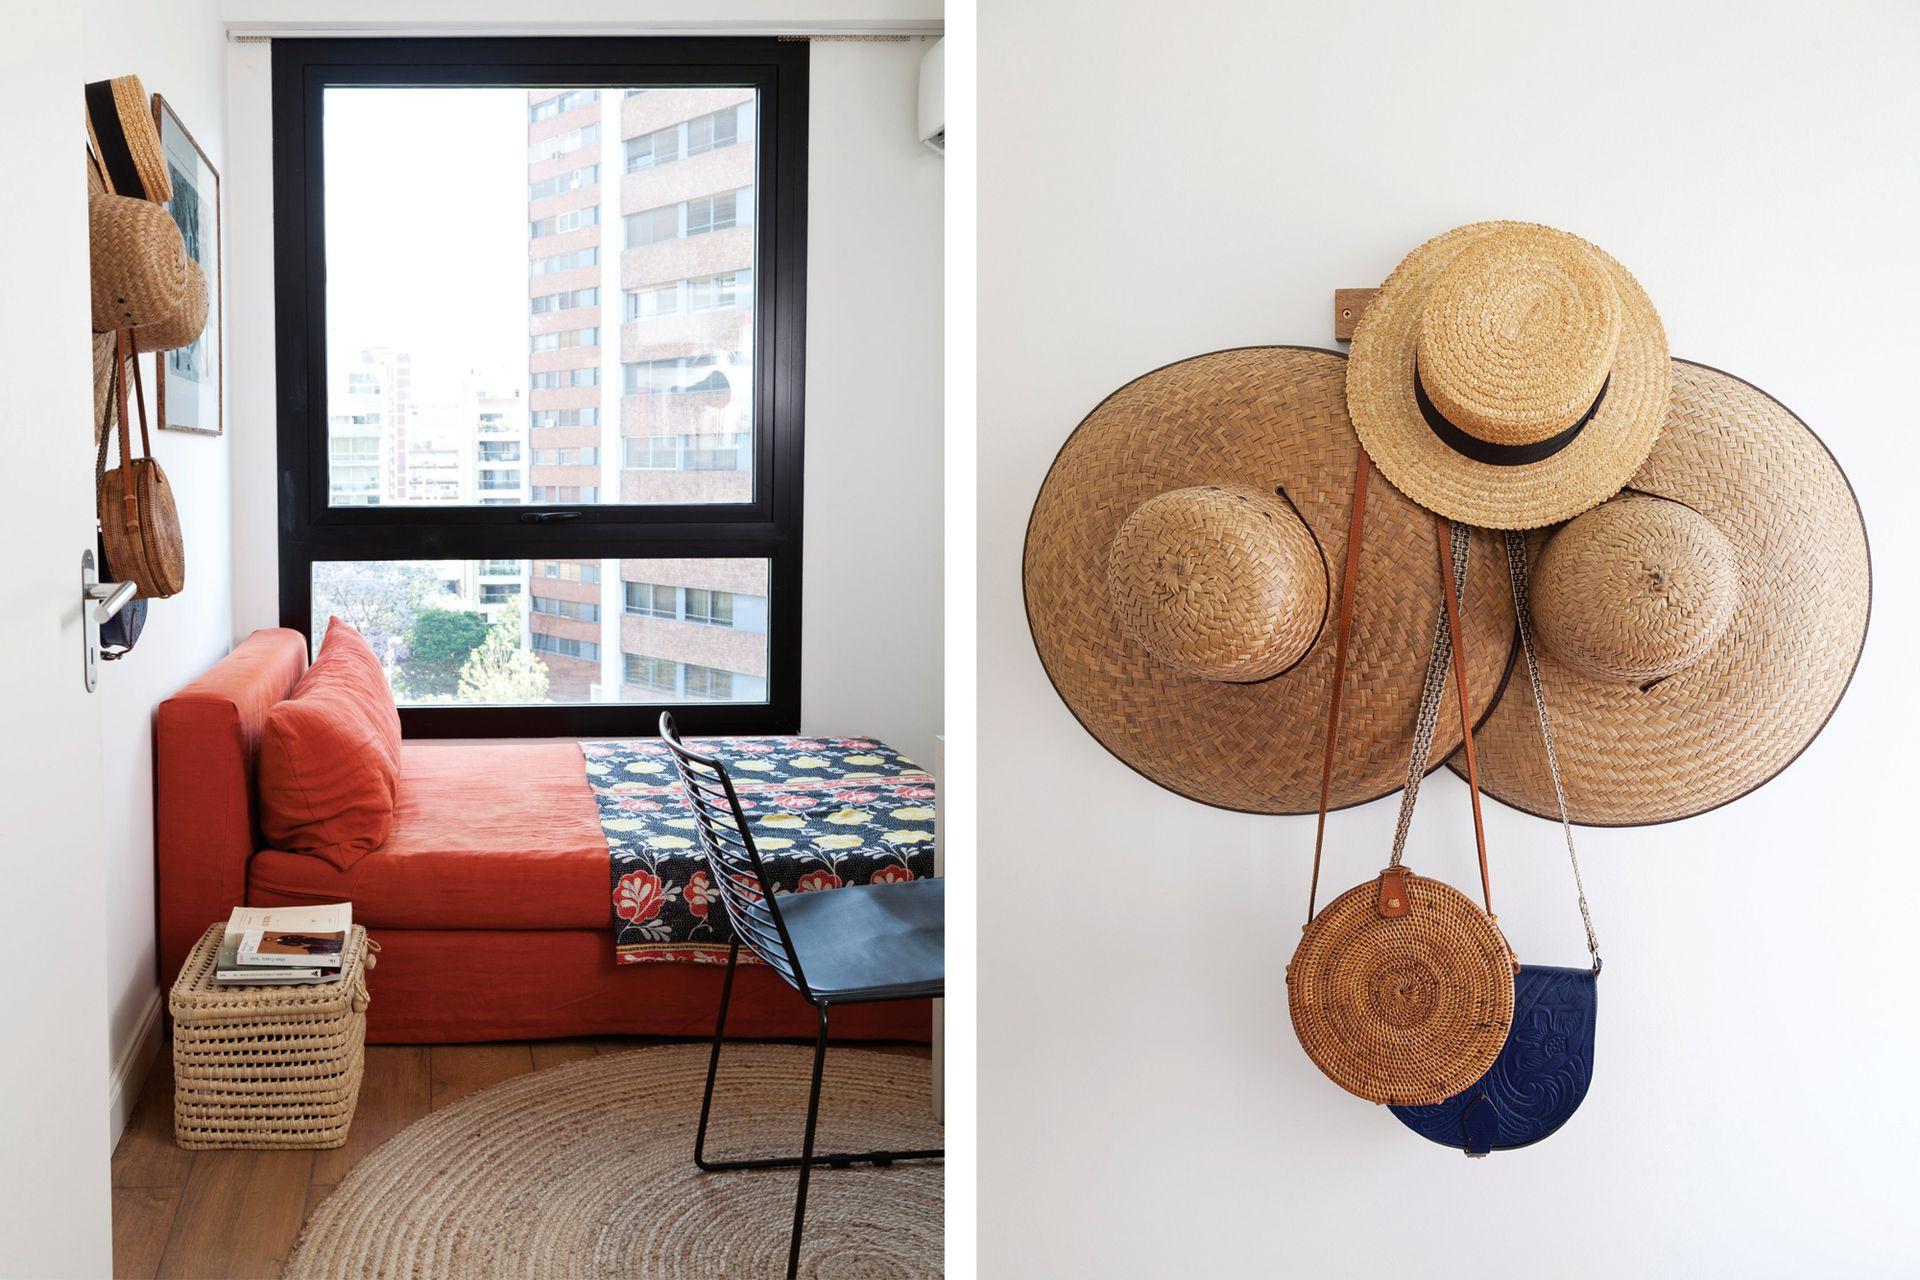 Sillón (Laura O) con funda de lino, alfombra redonda (La Redoute), silla 'Metal G' (Quiu).